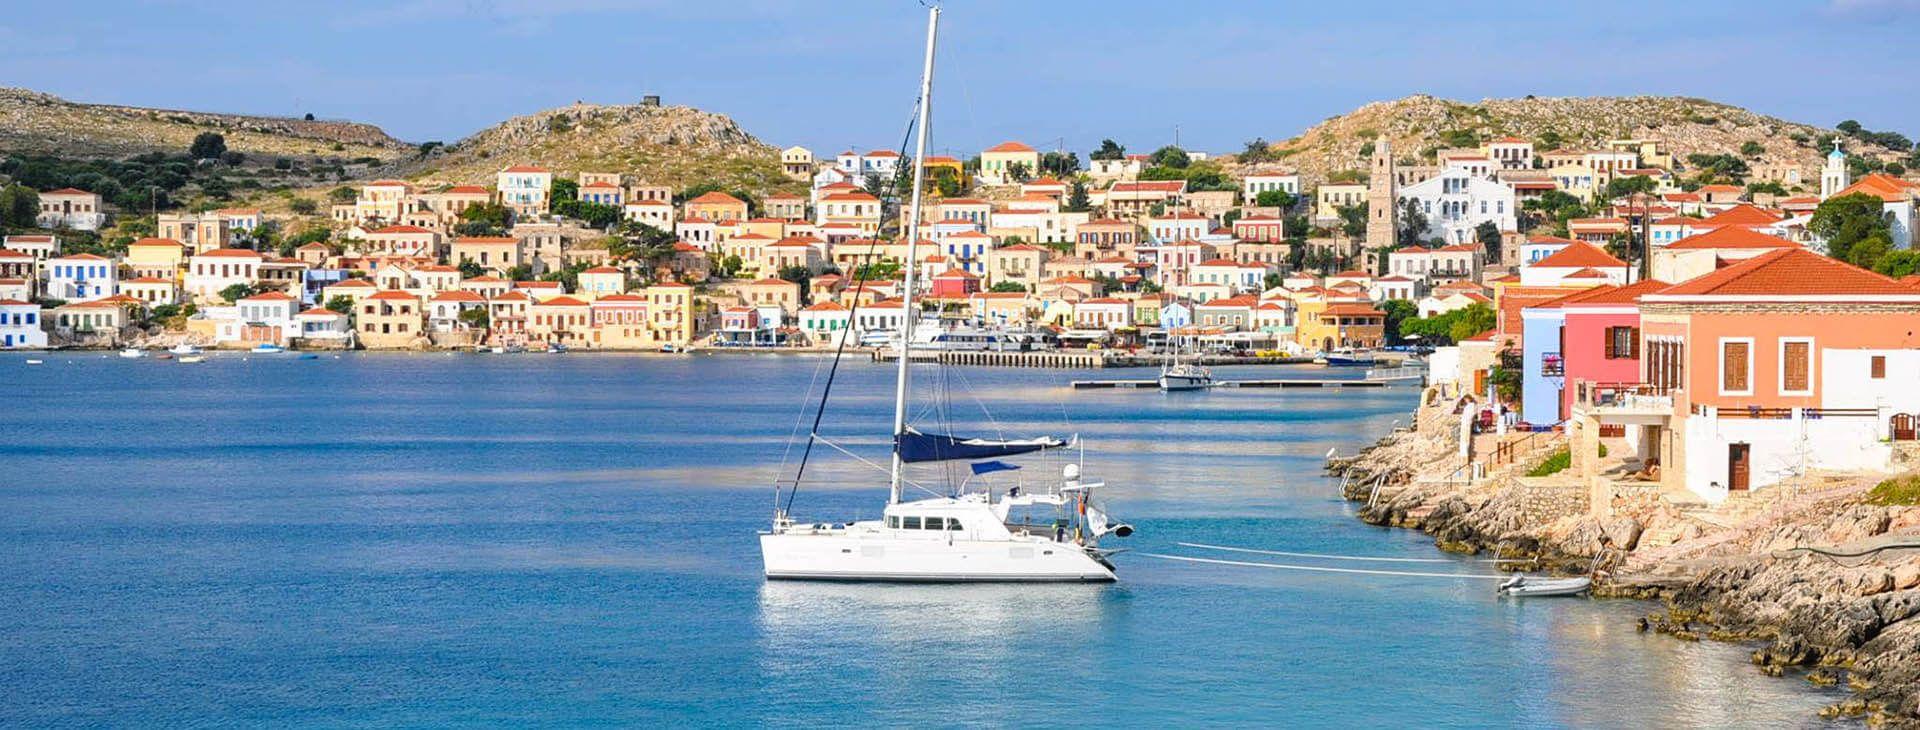 insule grecia | Vacante de 5 stele - Part 3